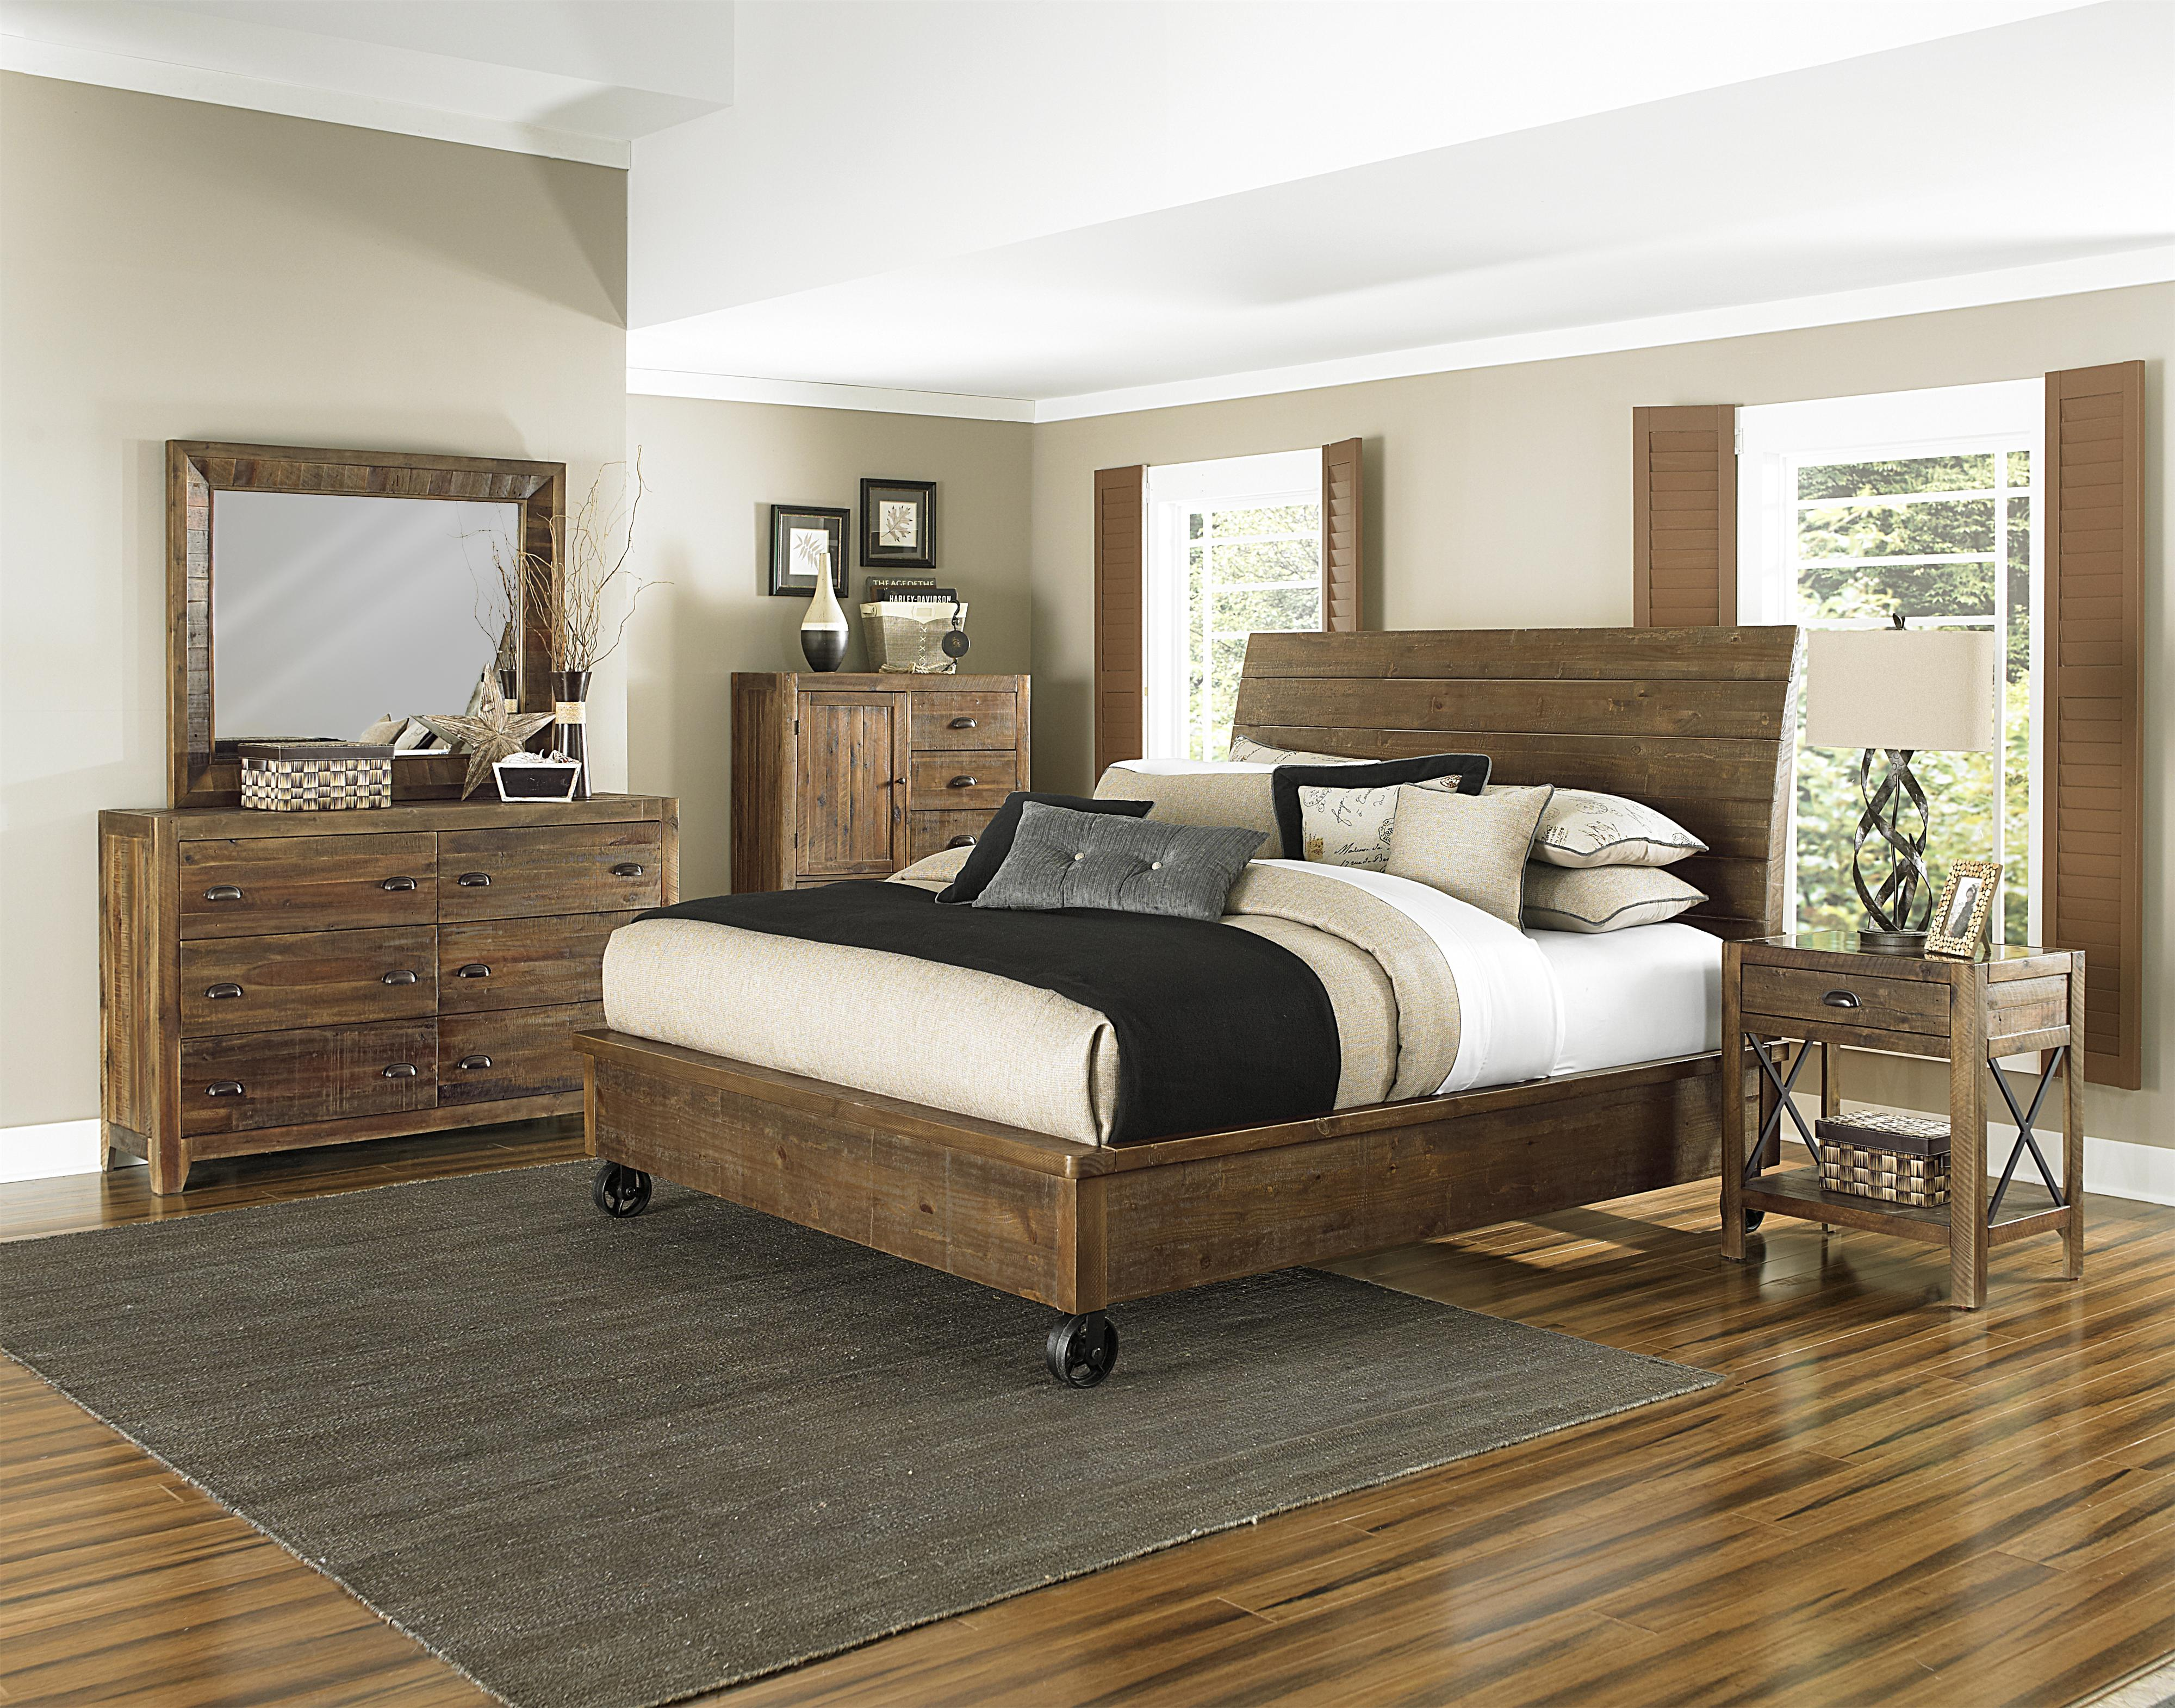 Magnussen Home  River Ridge King Bedroom Group - Item Number: B2375 K Bedroom Group 1